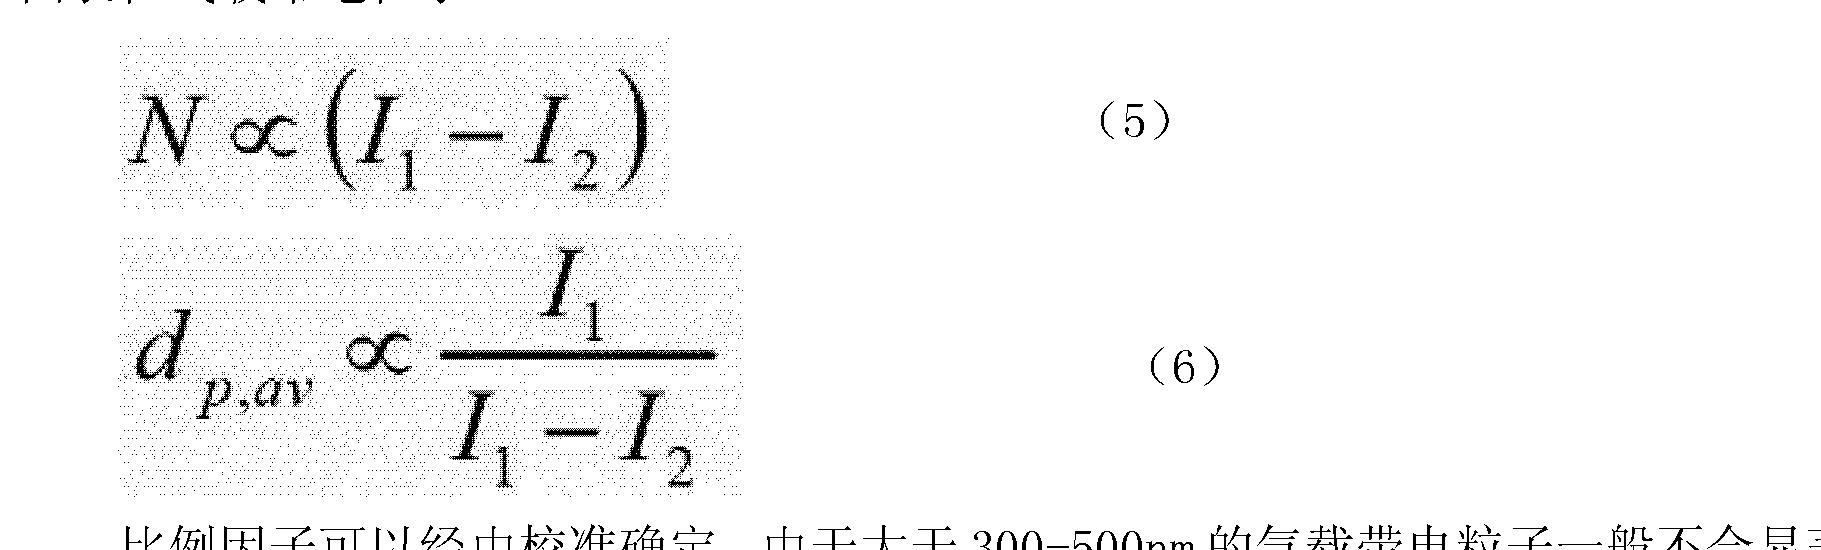 Figure CN102224406AD00121